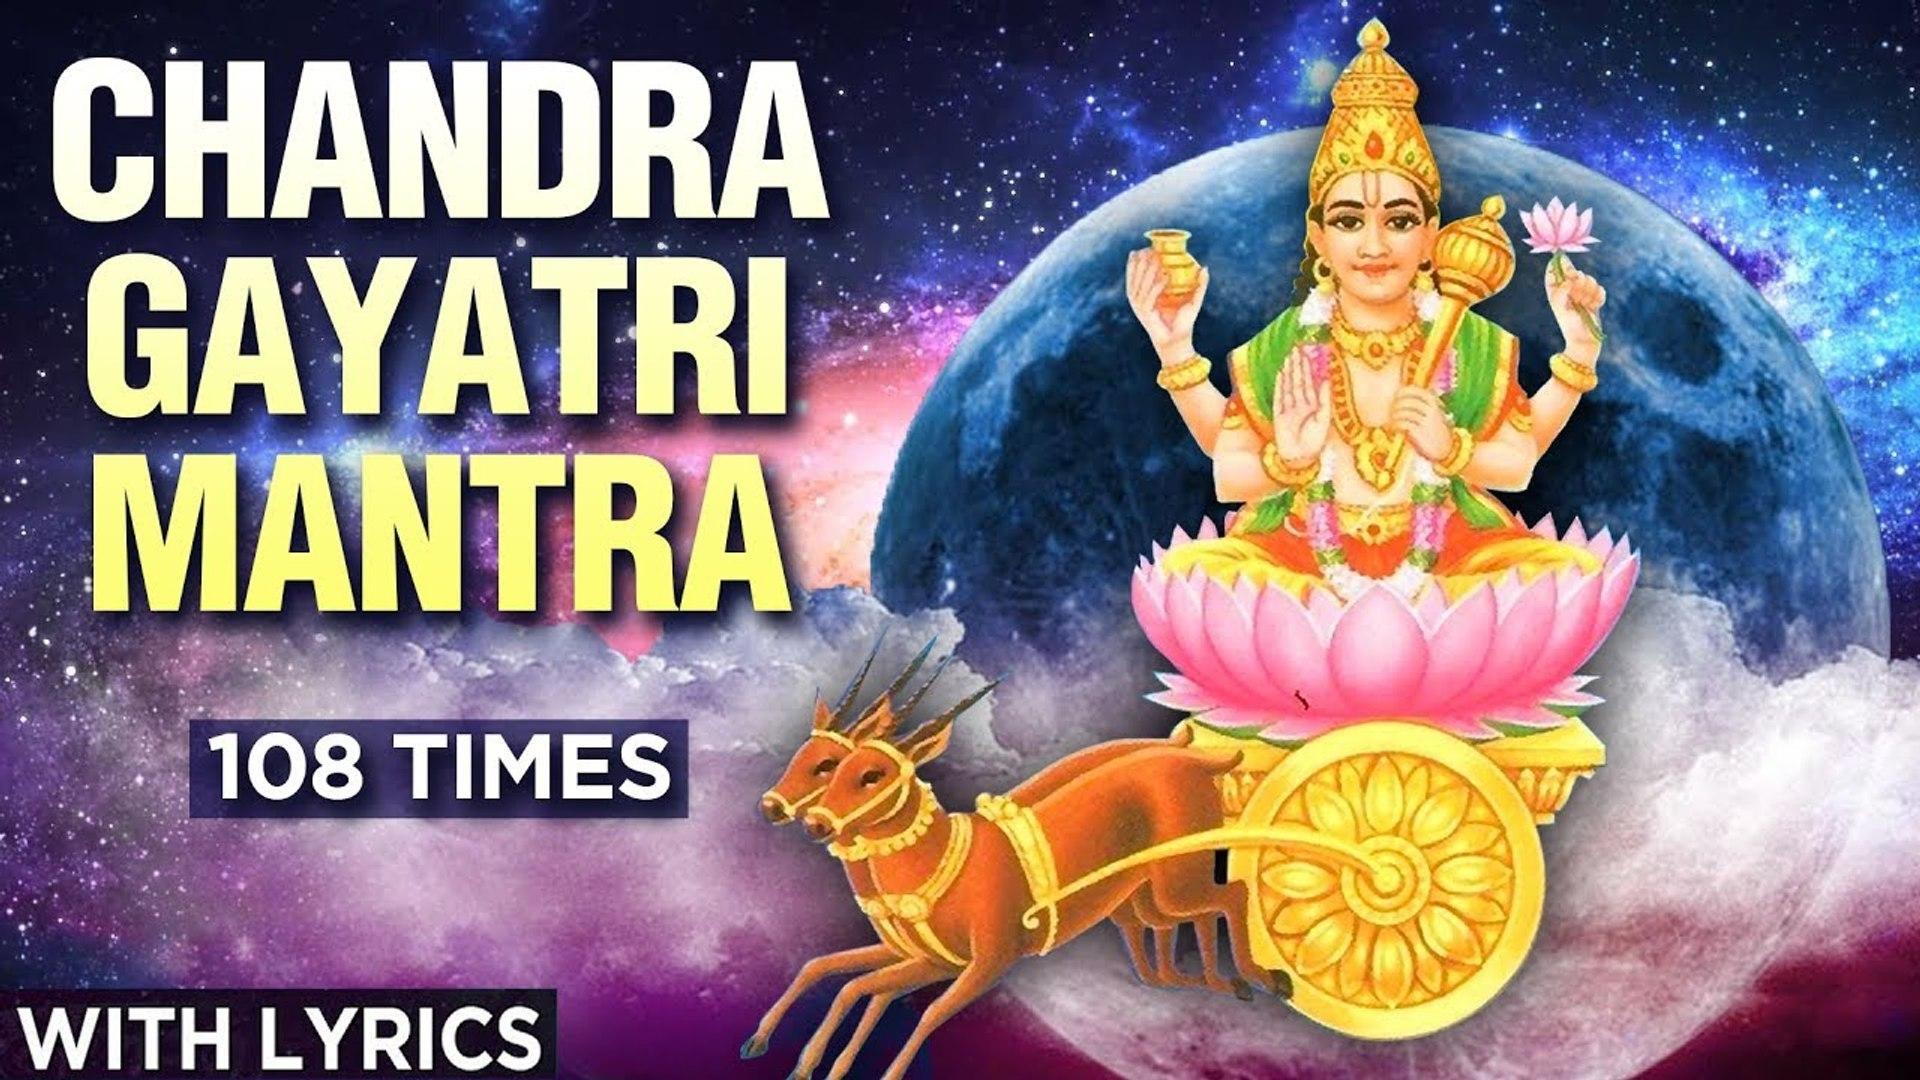 Chandra Gayatri Mantra 108 Times With Lyrics - Sharad Purnima Special | चंद्र गायत्री मंत्र १०८ बार